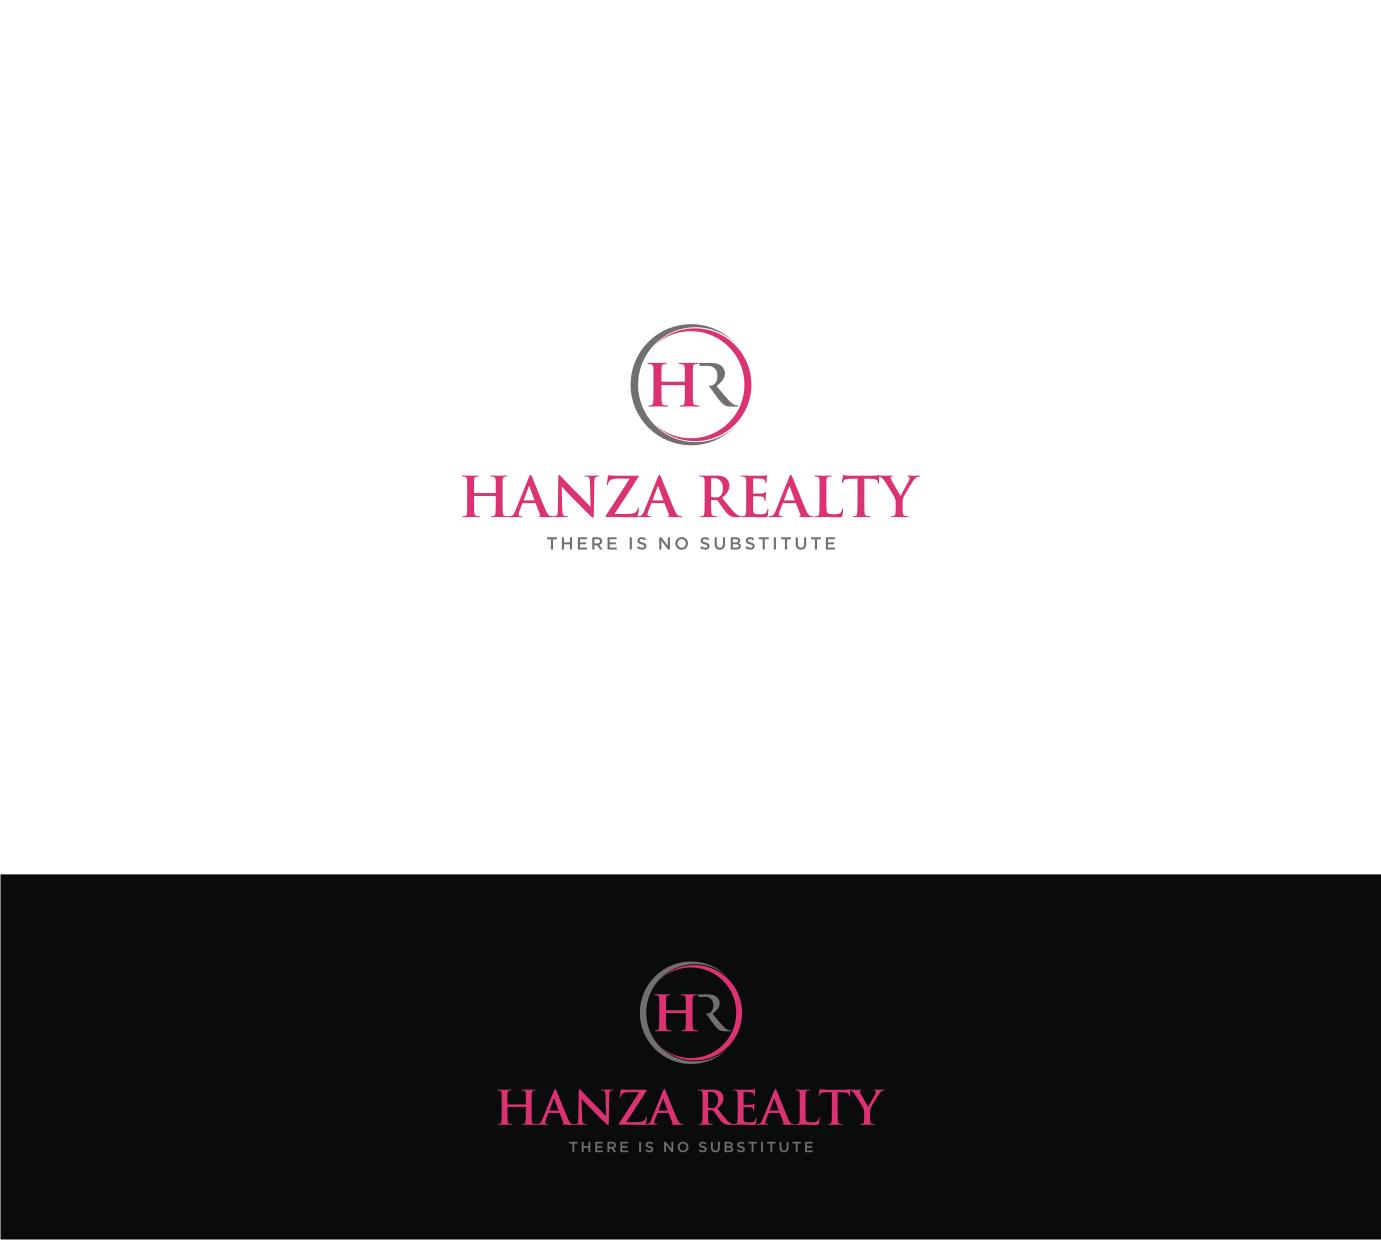 Logo Design by Sigitumarali Sigit - Entry No. 449 in the Logo Design Contest Logo Design for Hanza Realty.